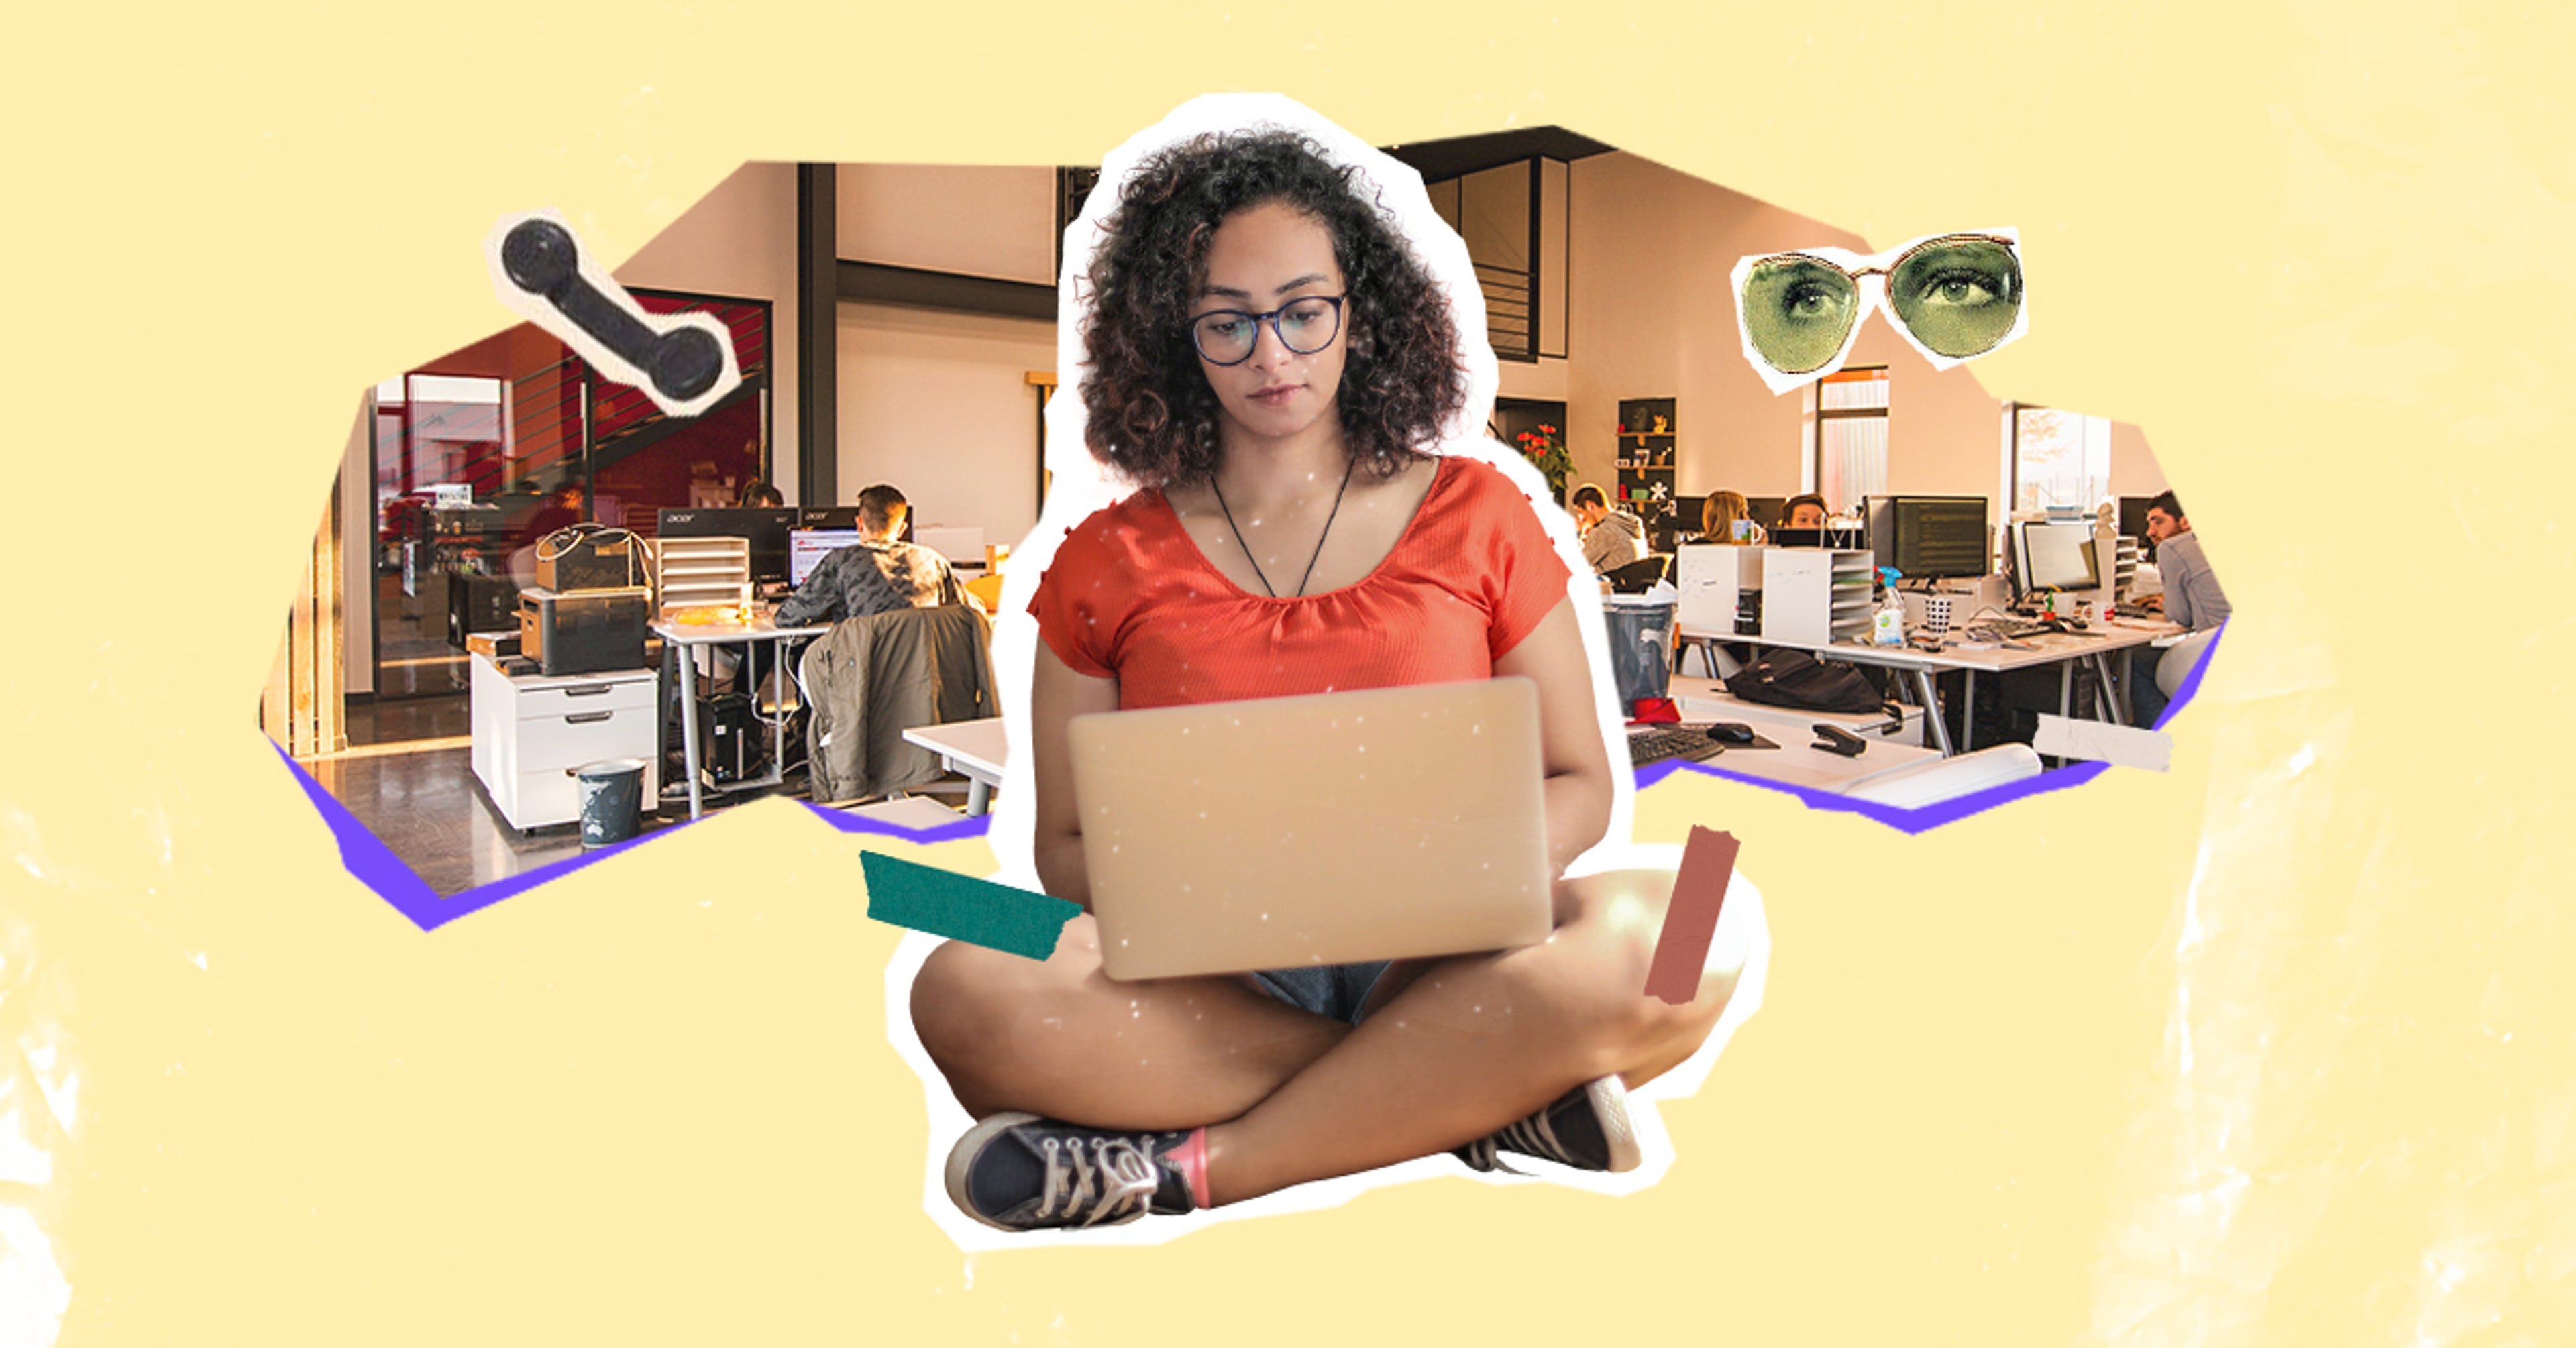 Novos tipos de trabalho: remoto x presencial?